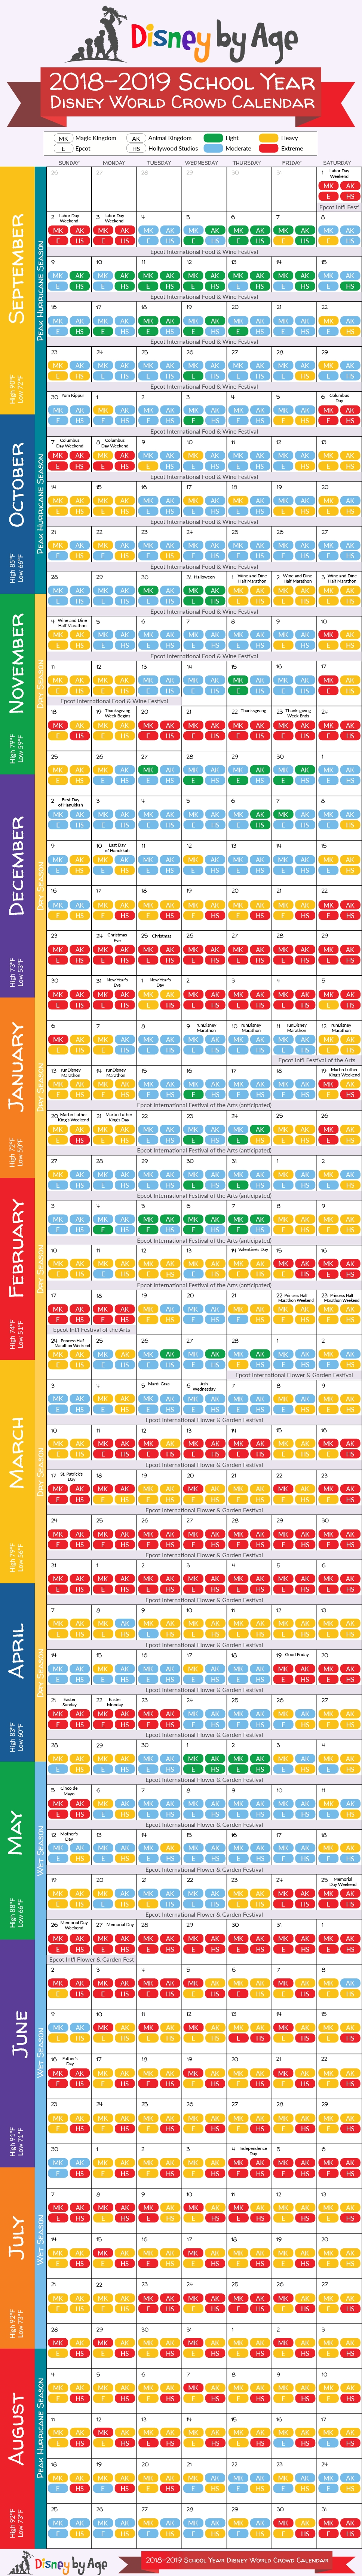 Disney World Crowd Calendar 2018 And 2019-Disney World Crowd Calendar January 2020